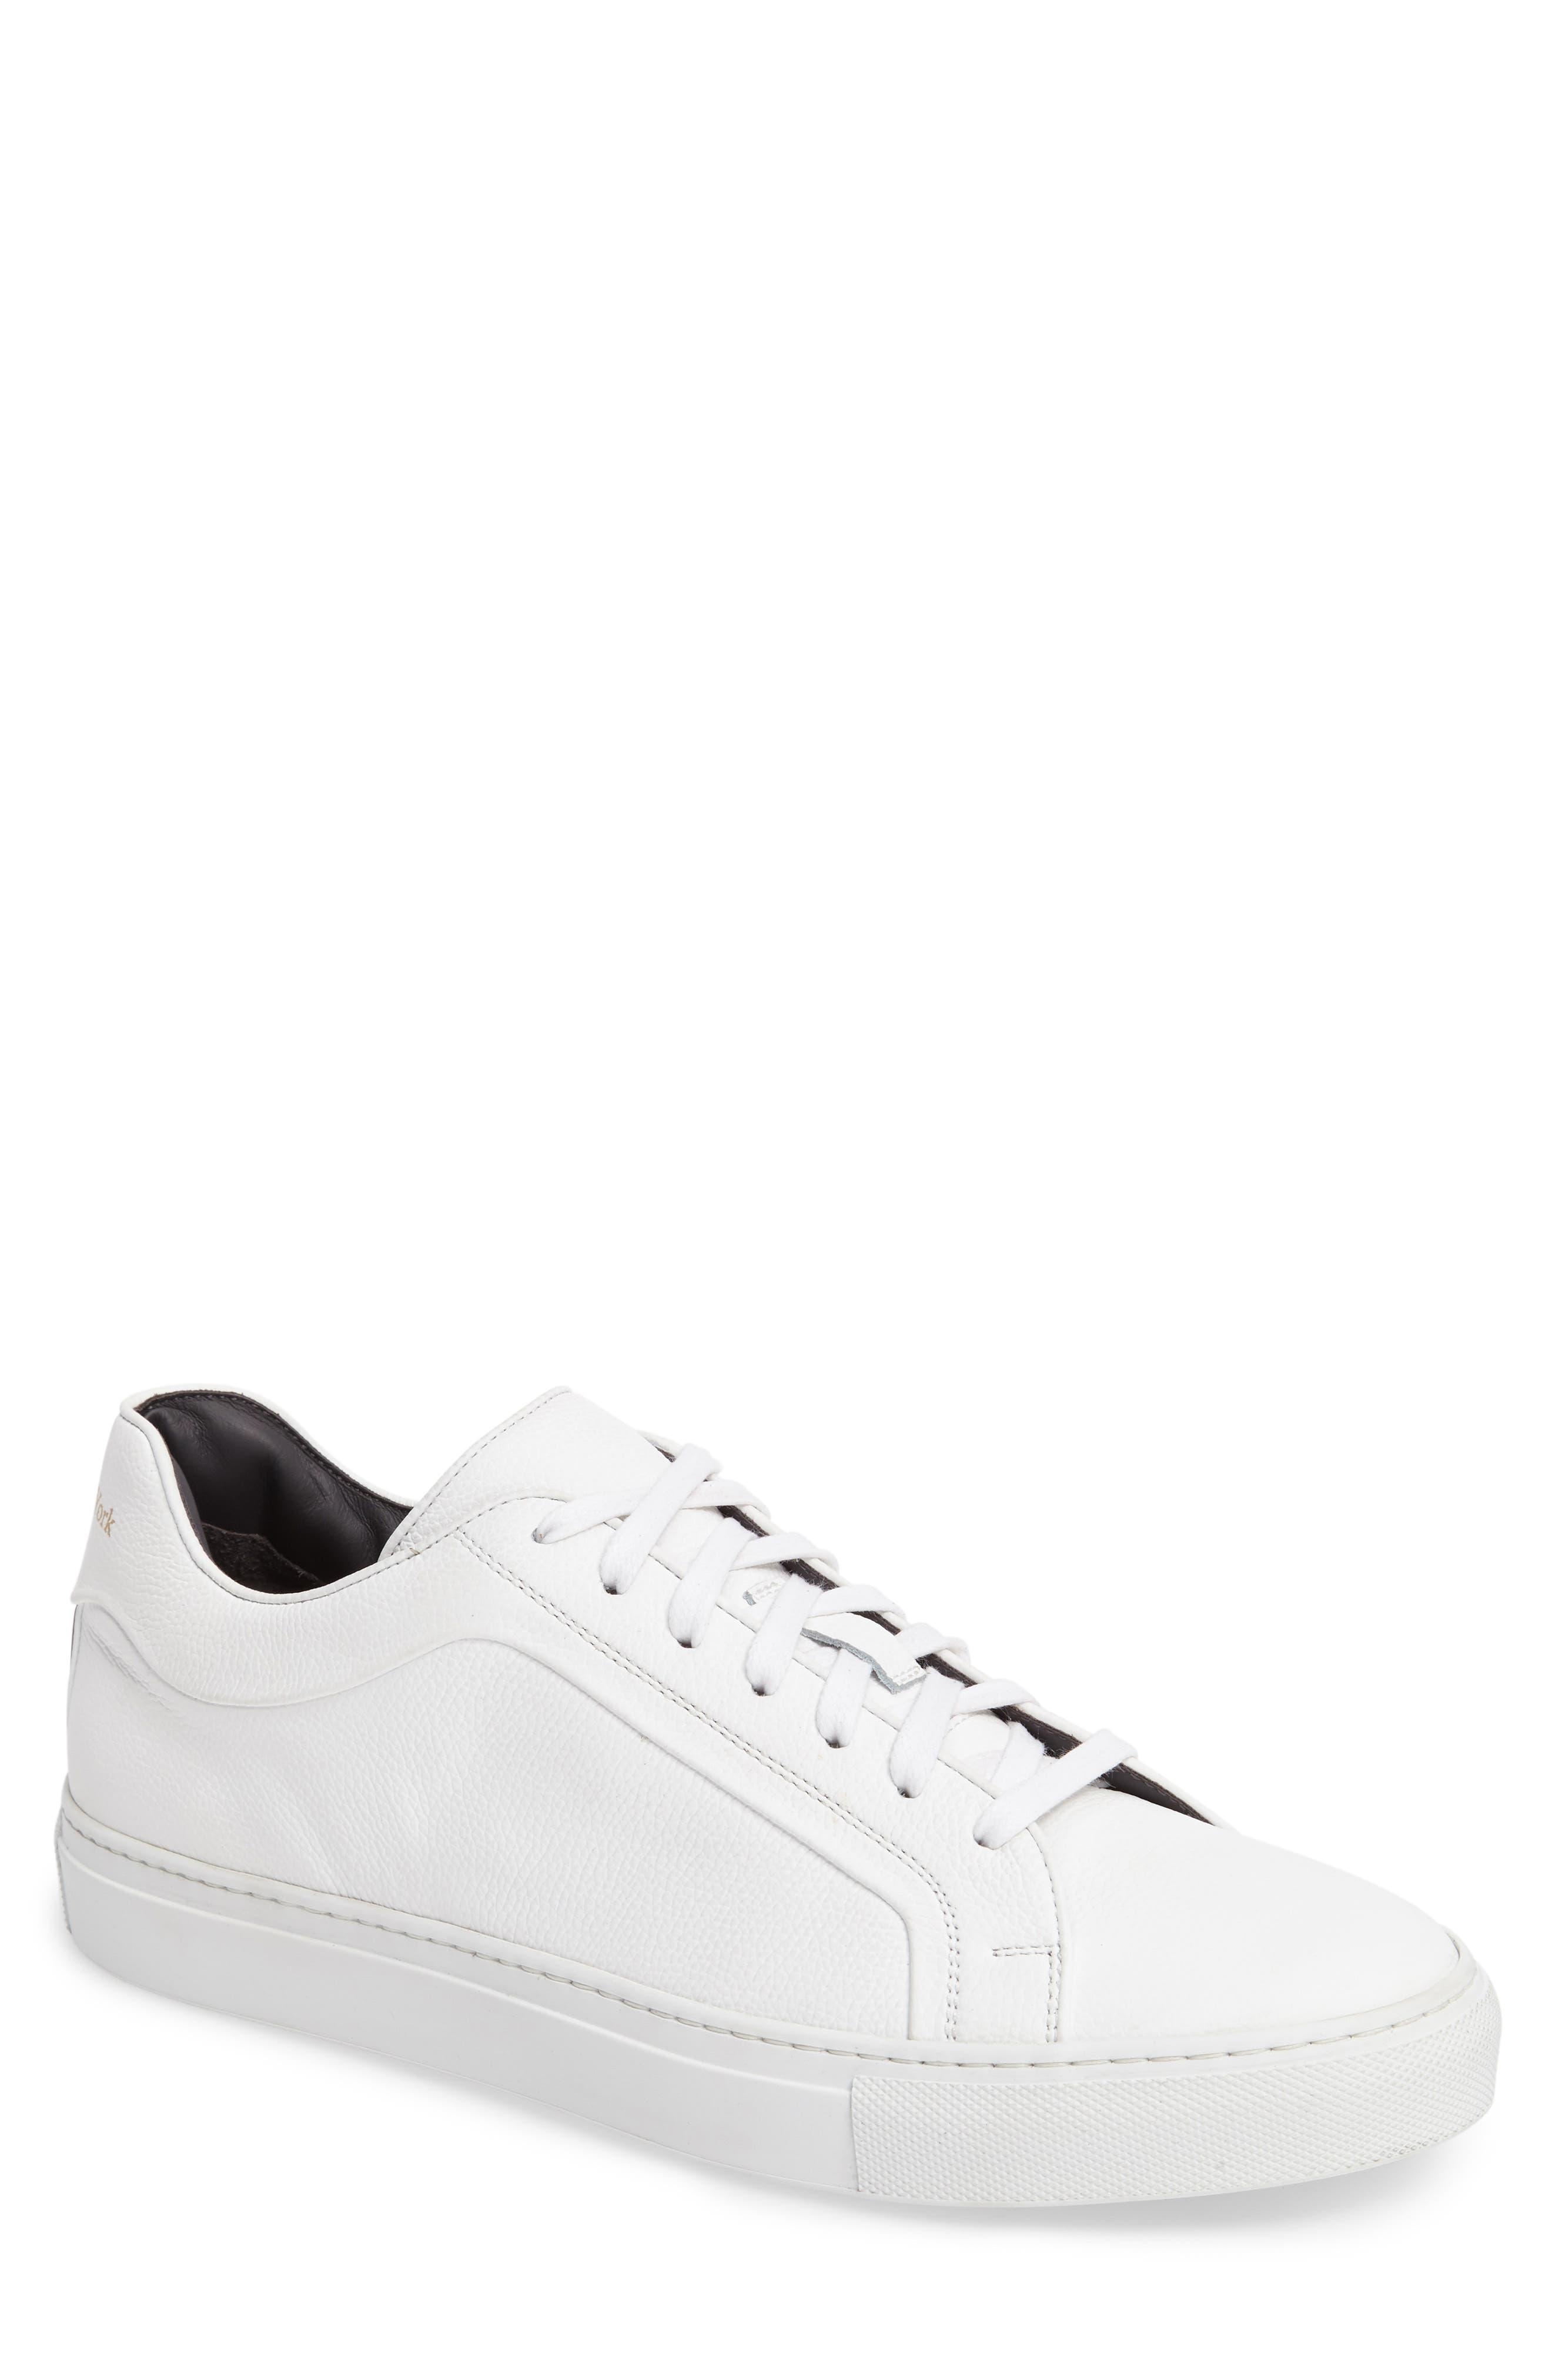 To Boot New York Thomas Sneaker (Men)